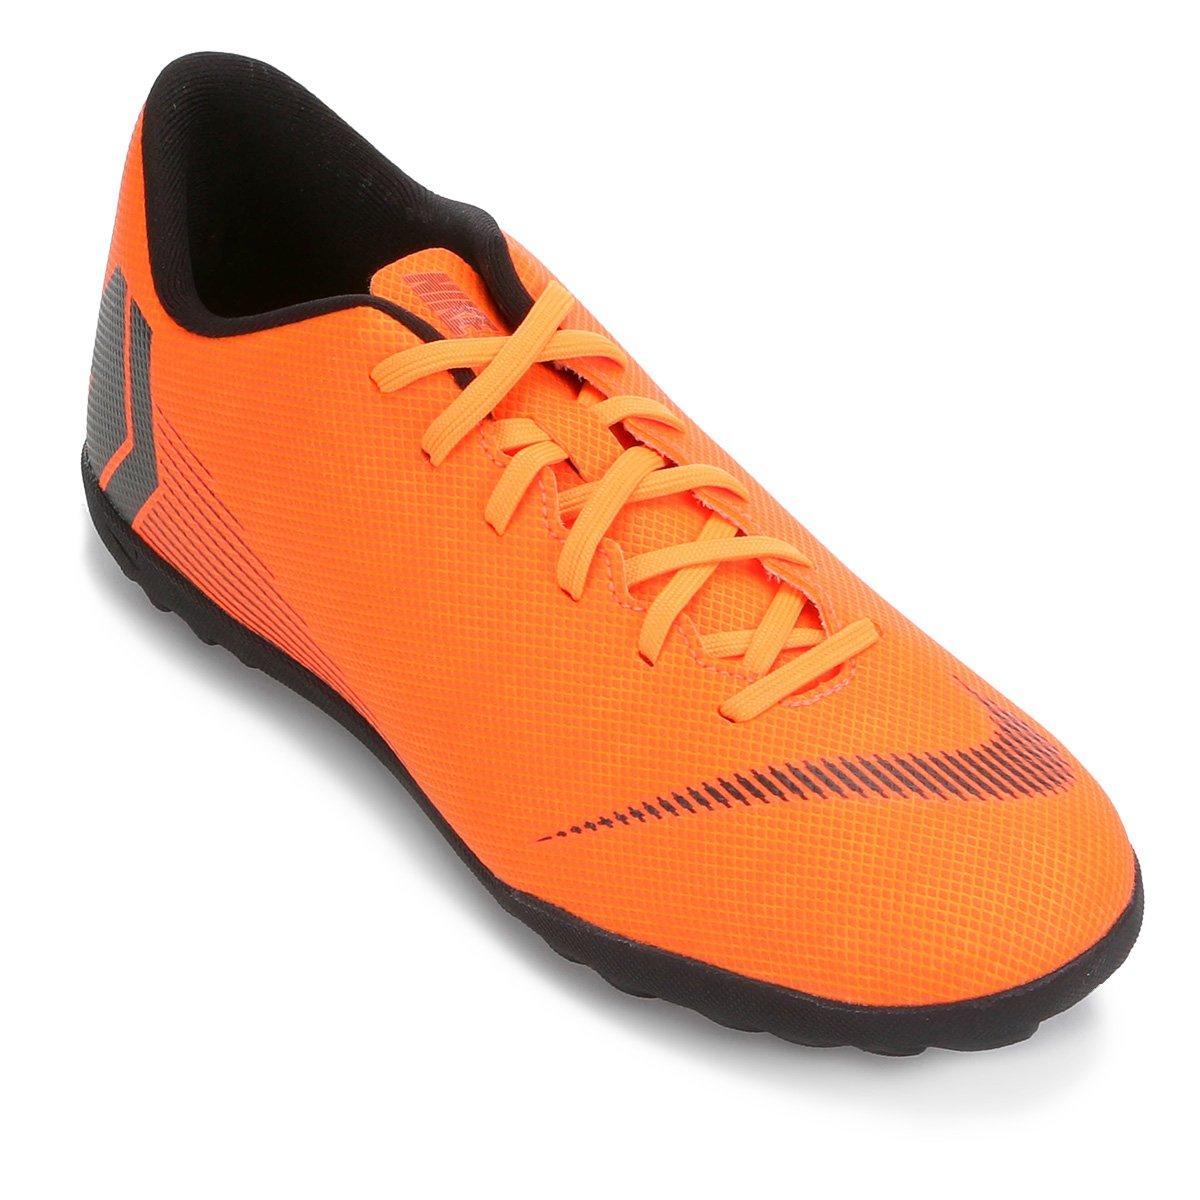 658509f7af 12 Laranja Masculina Vapor Nike Preto Chuteira Mercurial Society Club e  qAcBPBwIS ...